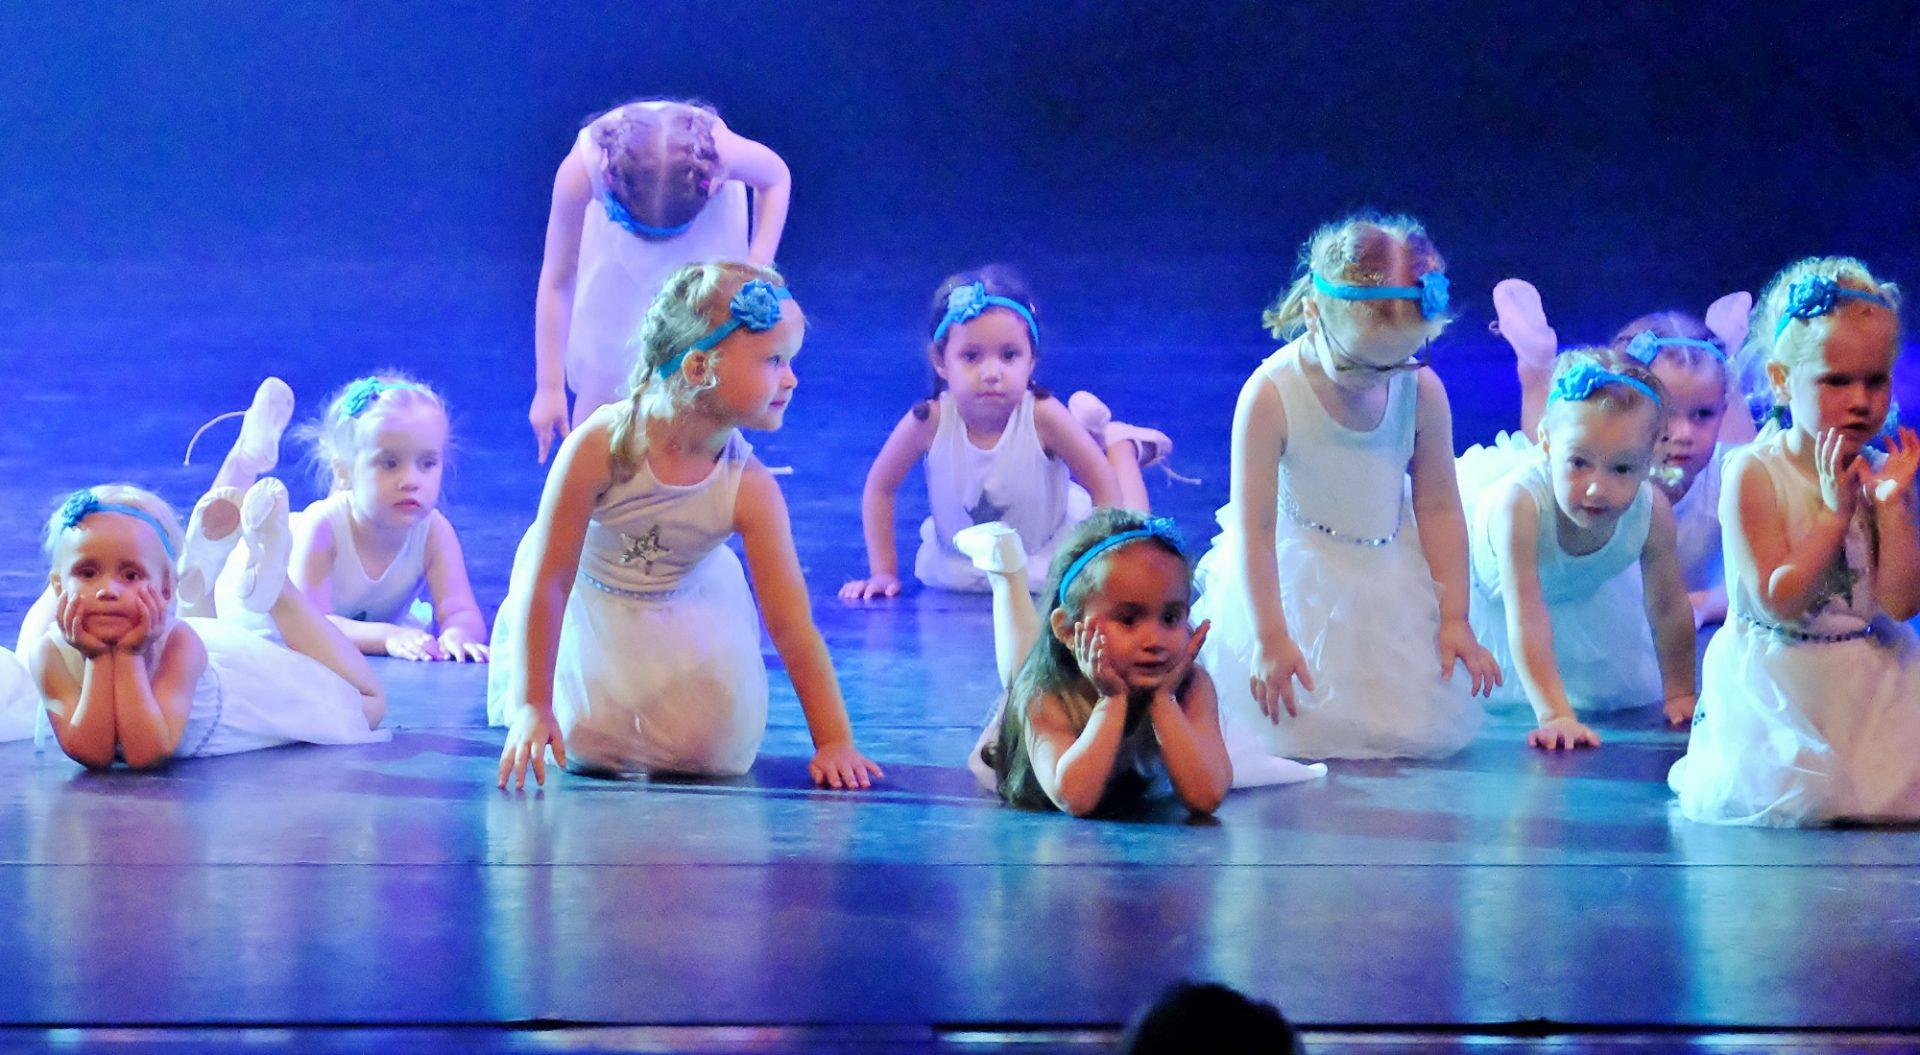 Peuters eindvoorstelling Dance Studio Patty